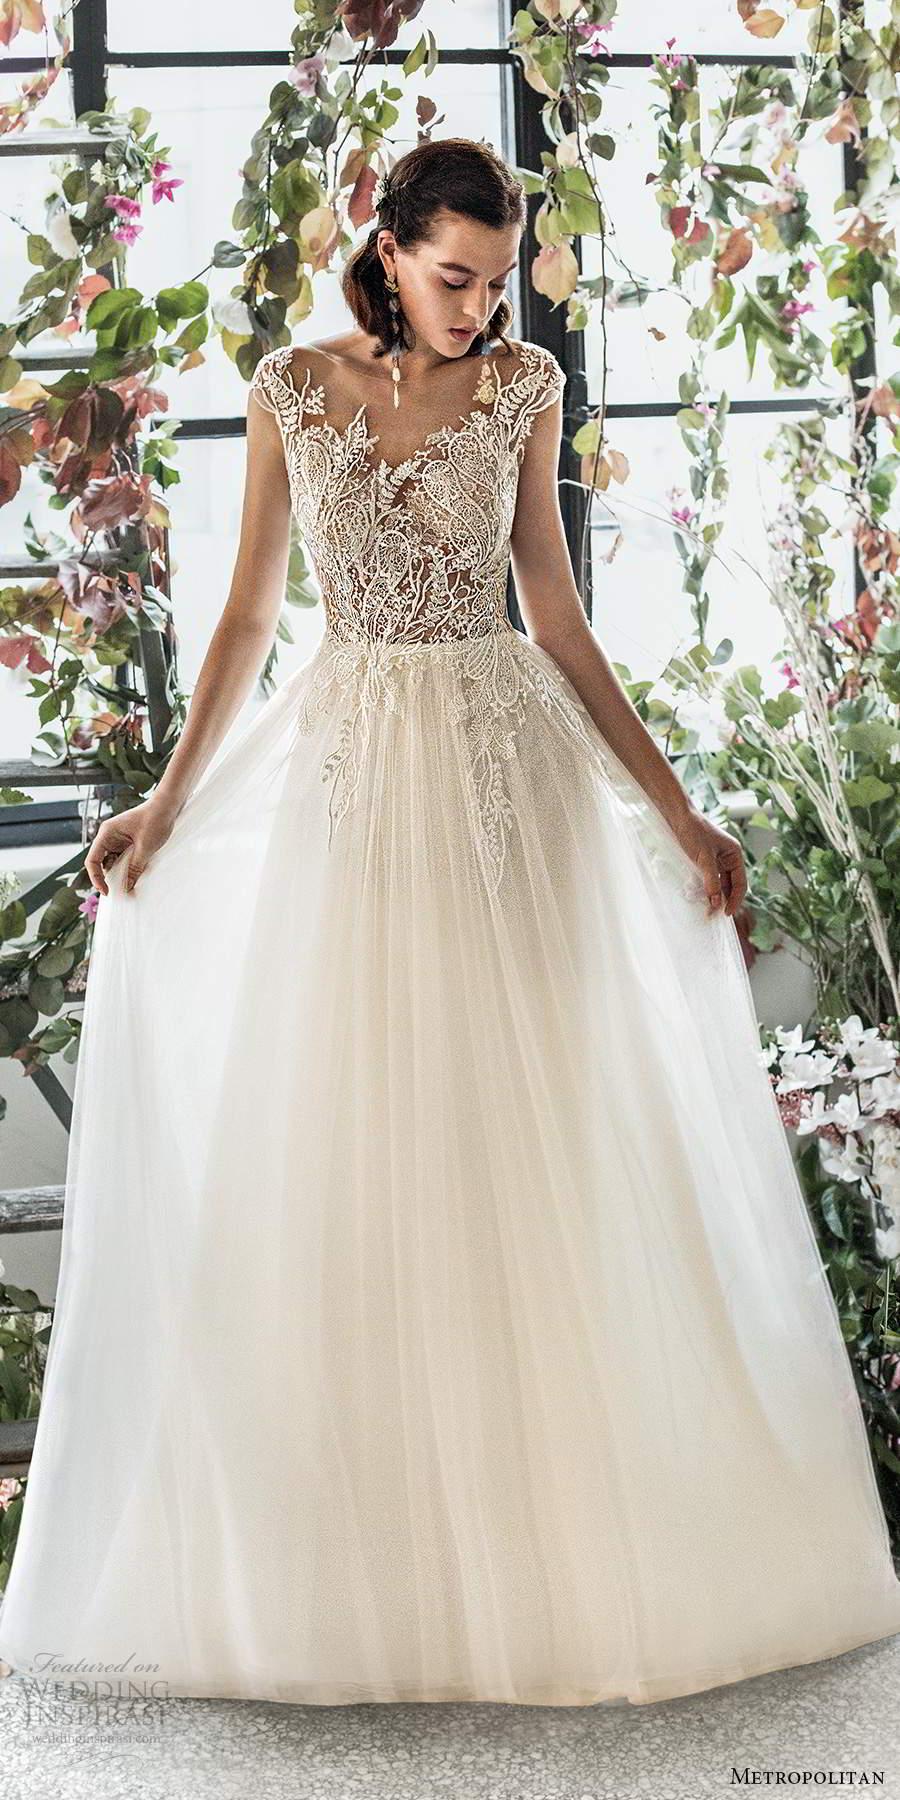 metropolitan spring 2020 bridal illusion cap sleeves sheer bateau semi sweetheart neckline embellished lace bodice soft a line wedding dress low back chapel train (9) mv